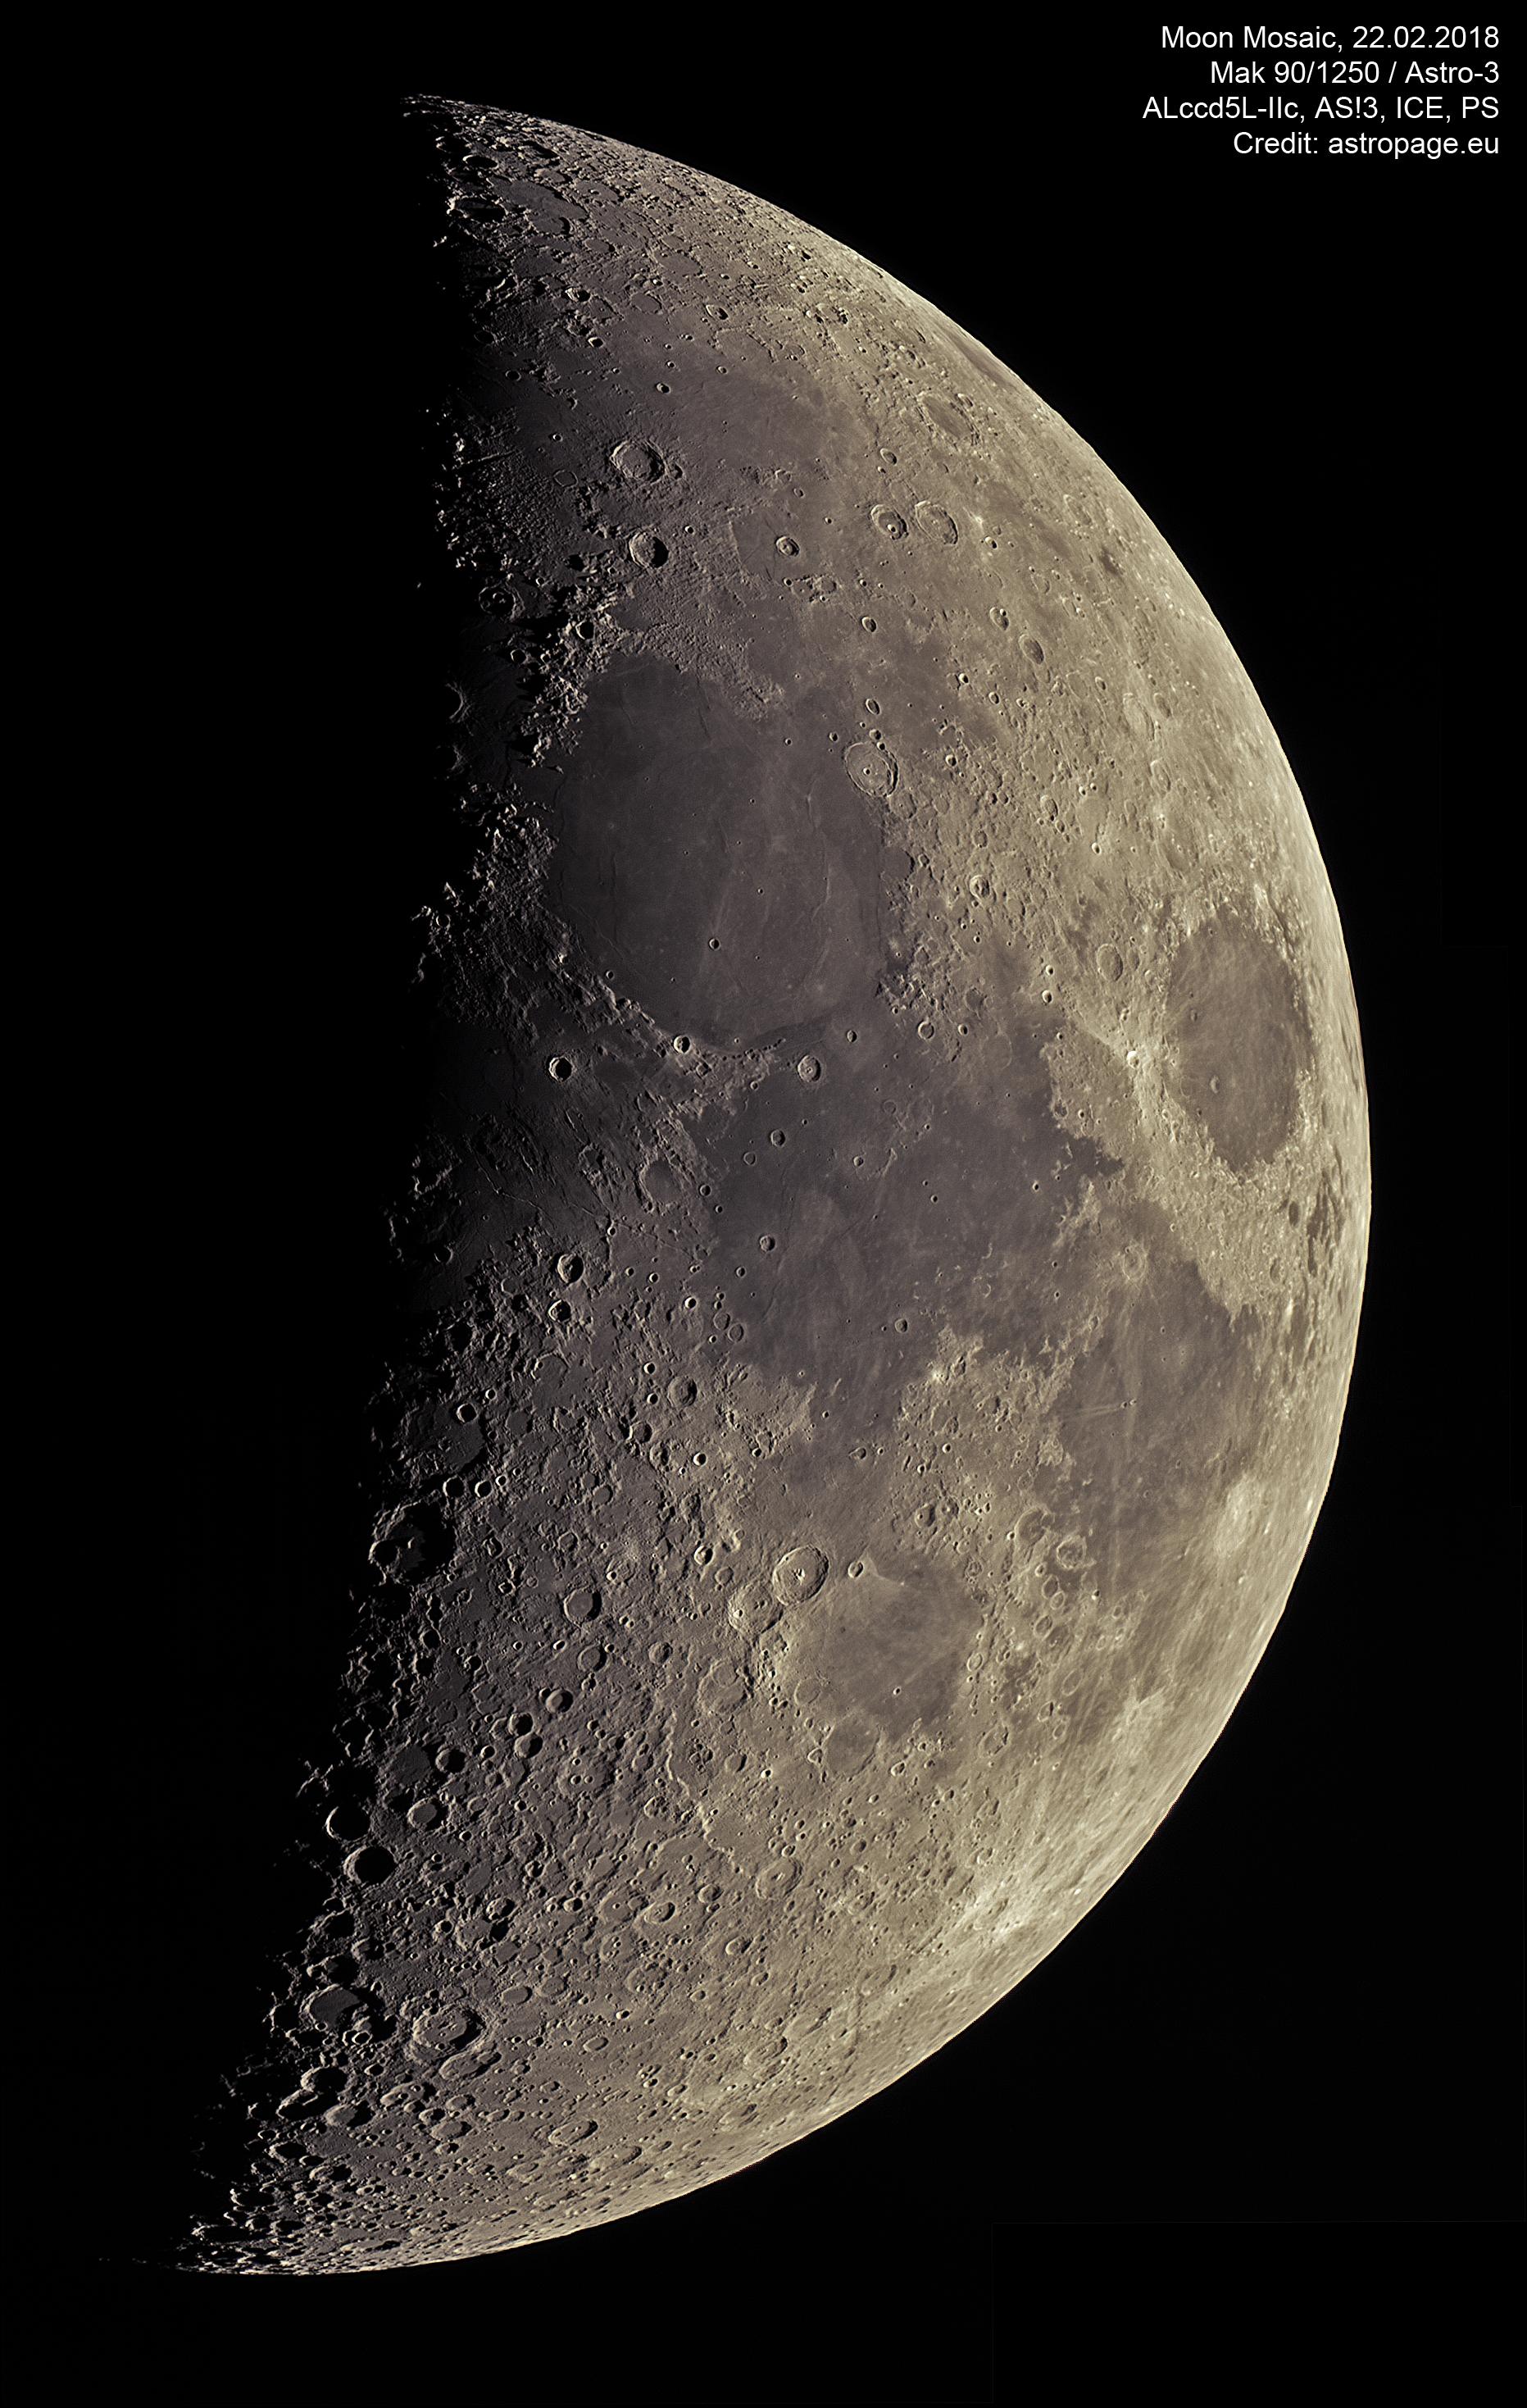 Mond-Mosaik vom 22. Februar 2018. (Credit: astropage.eu)